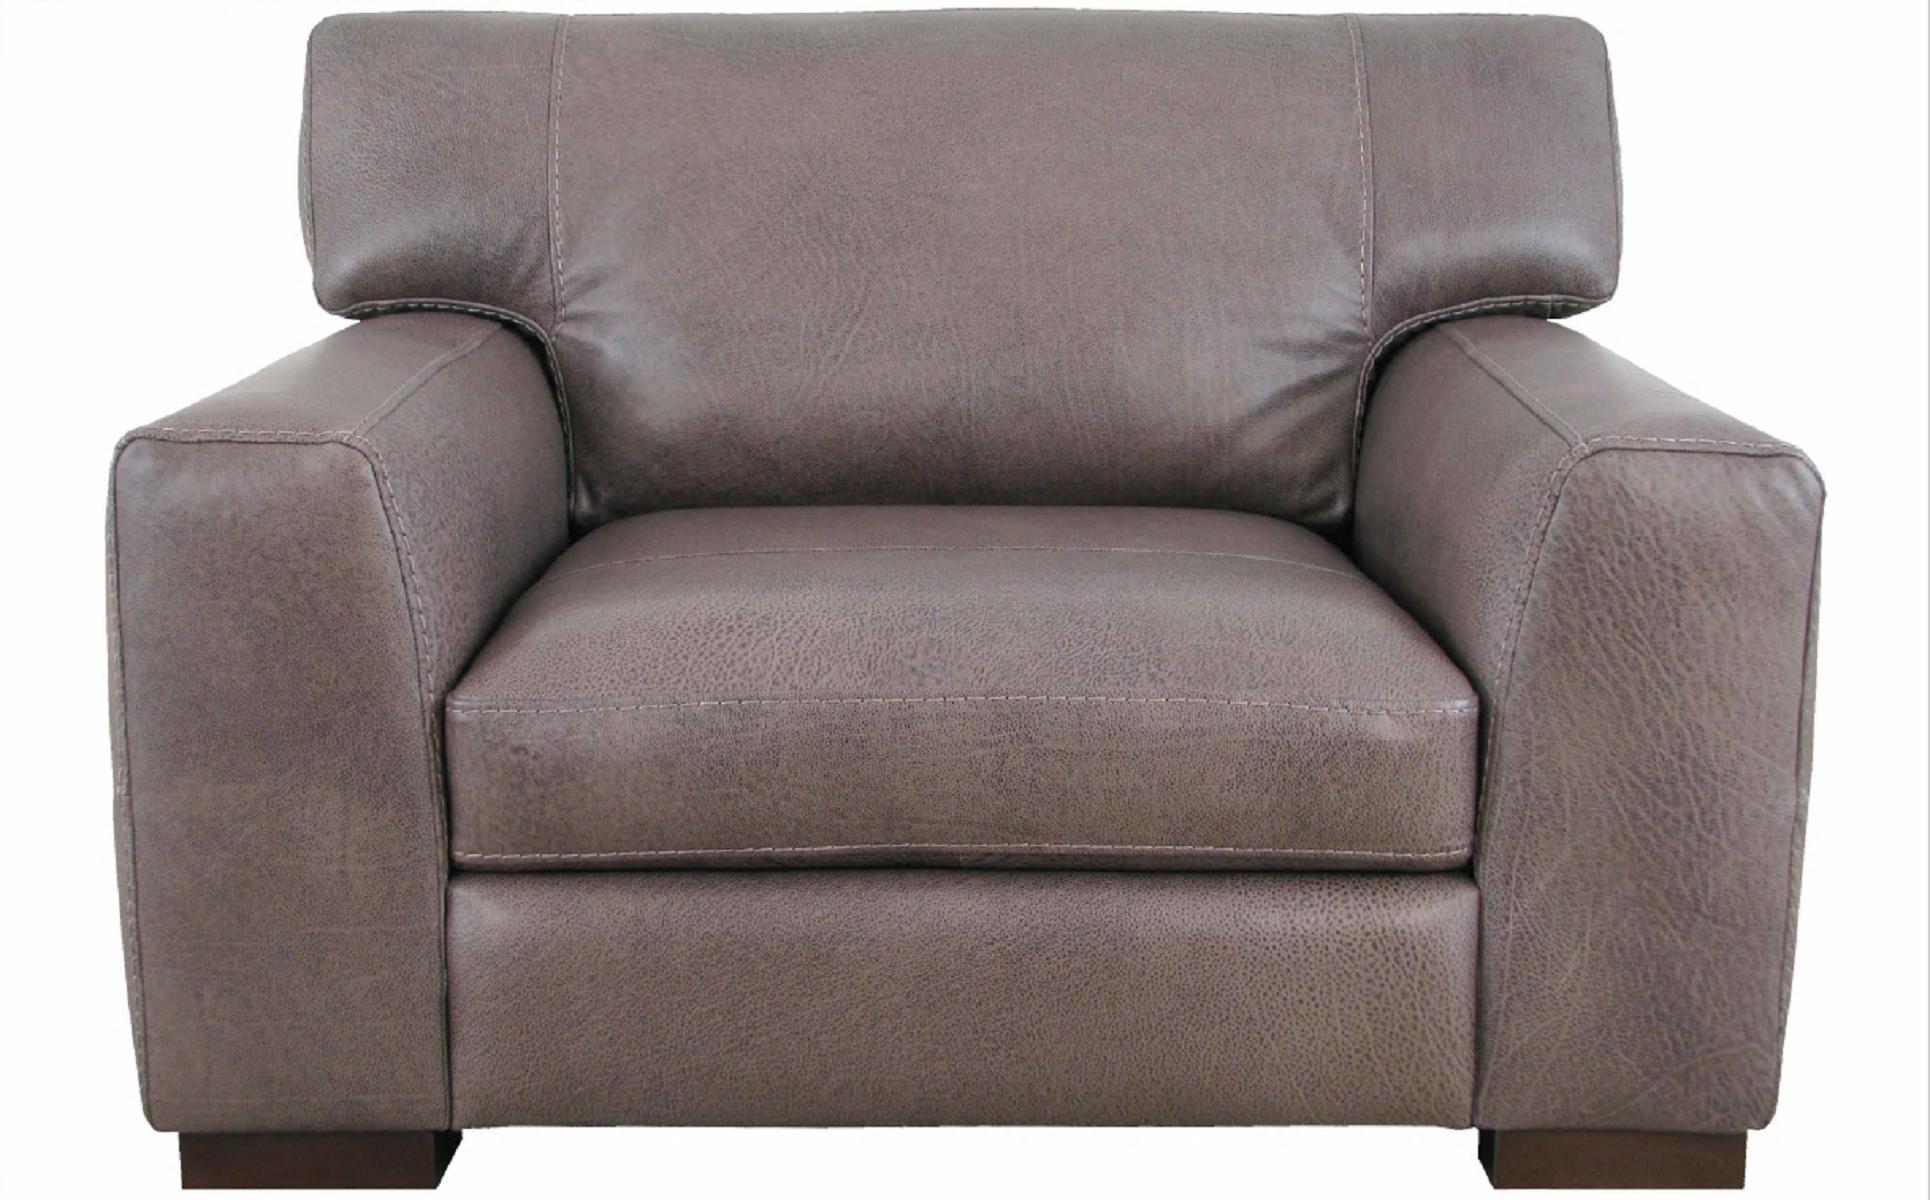 Ancona Maxi Chair